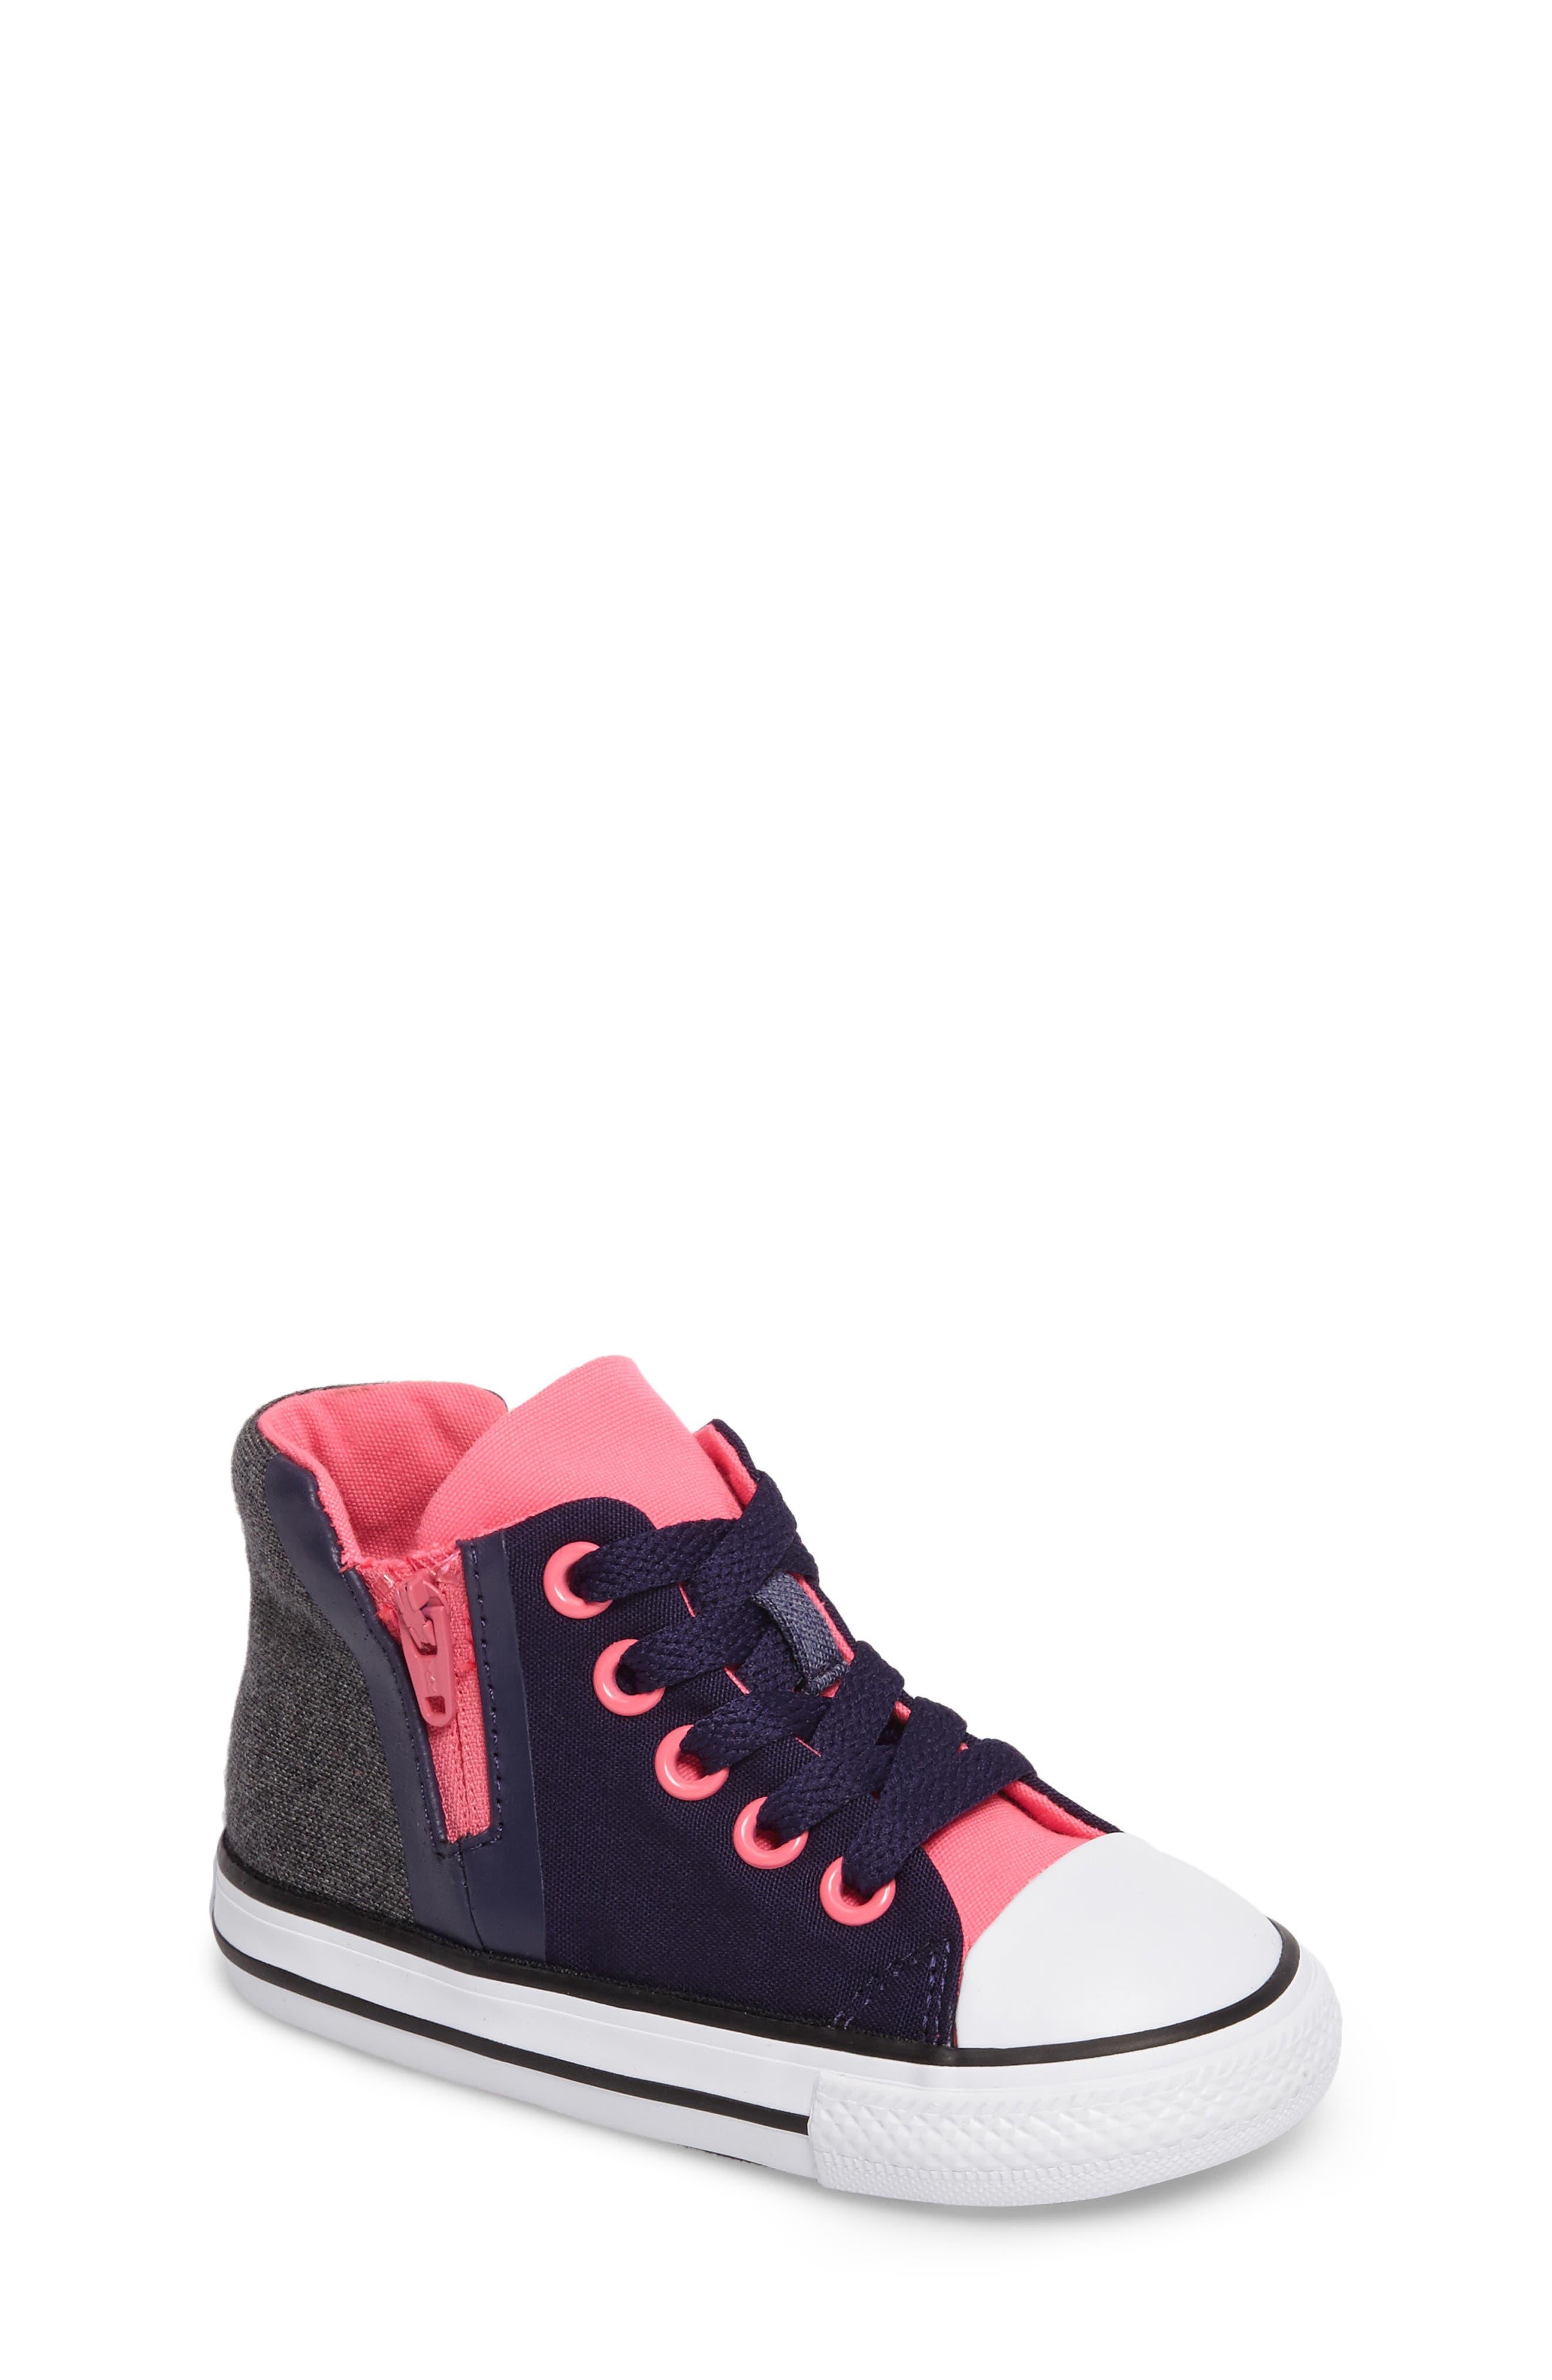 Main Image - Converse Chuck Taylor® All Star® Sport Zip High Top Sneaker (Baby, Walker, Toddler, Little Kid & Big Kid)